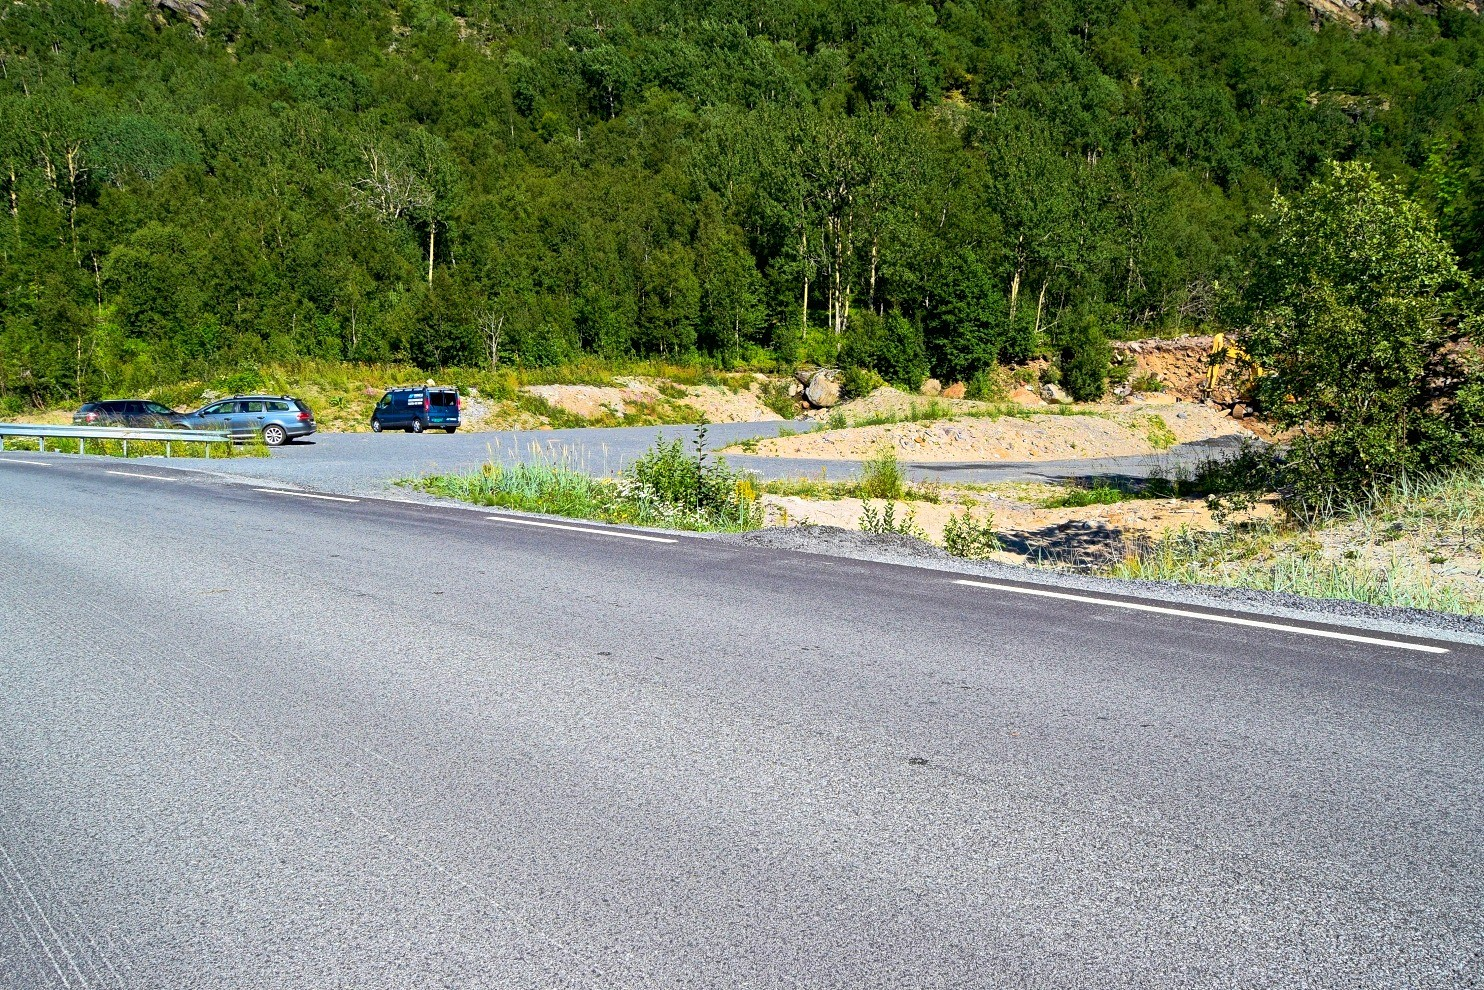 Parkeringsplassen ved Korsviksanden